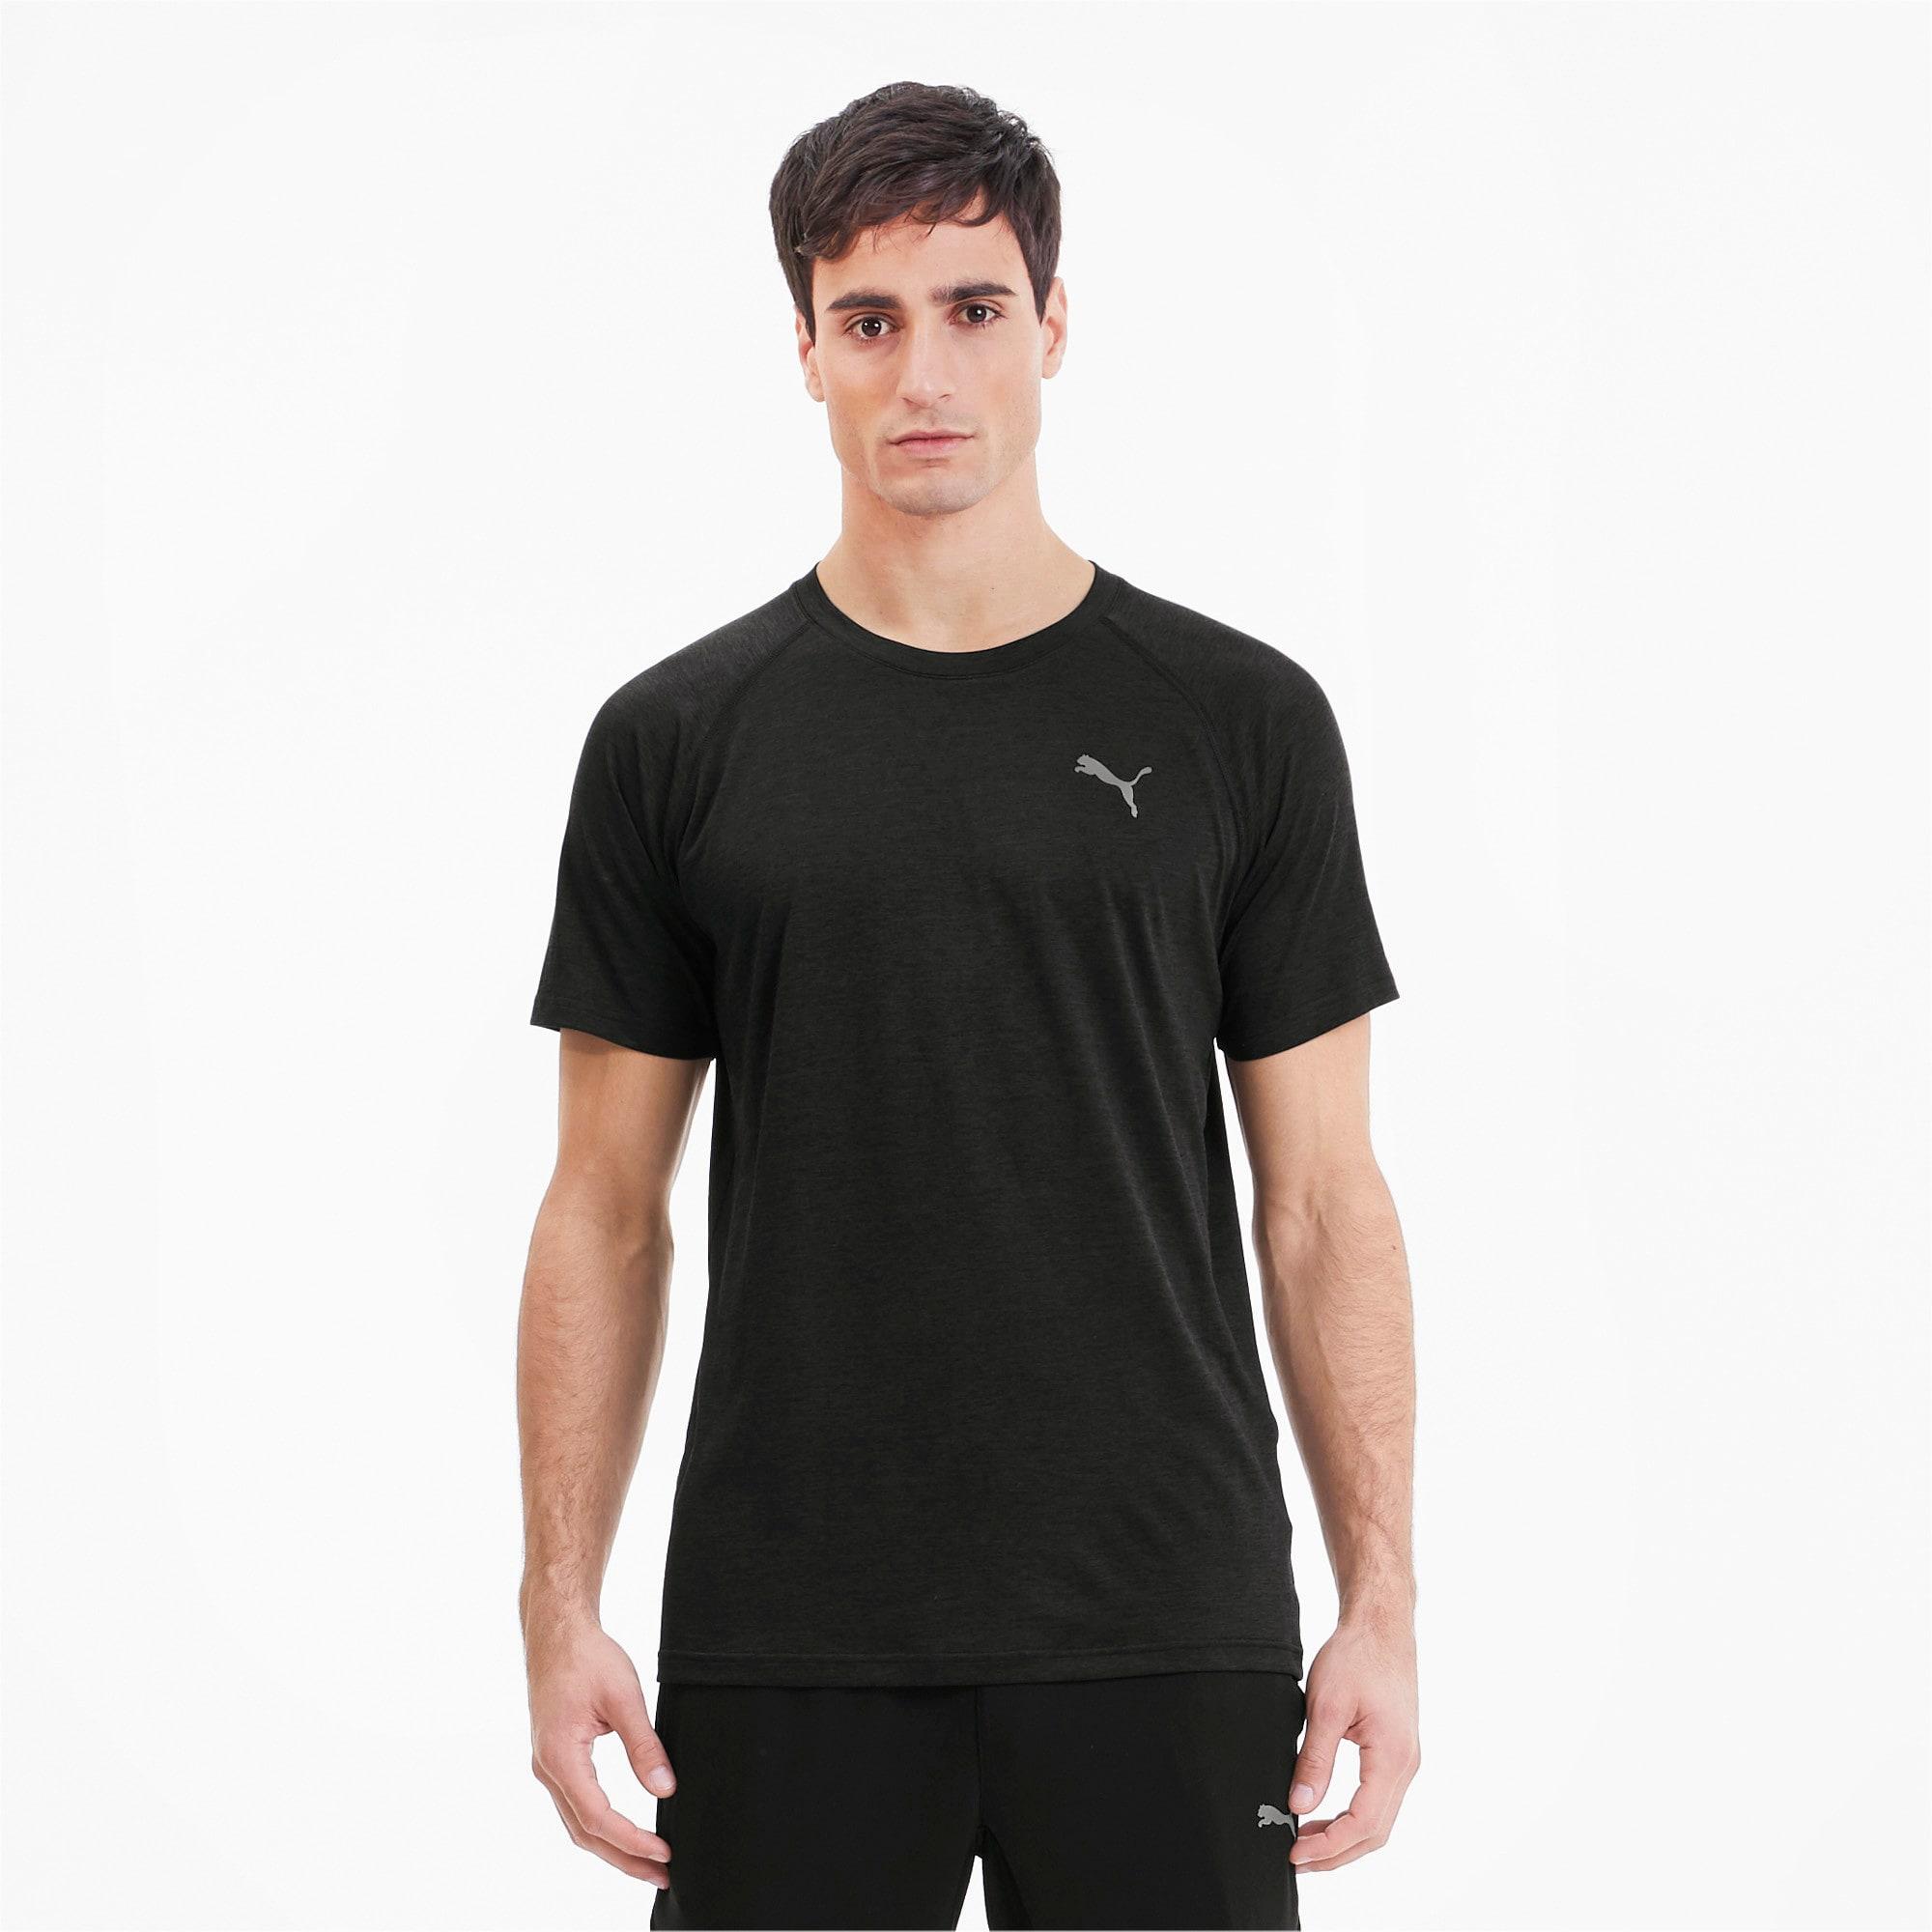 PUPMA Heather dryCELL Men's Training T-Shirt